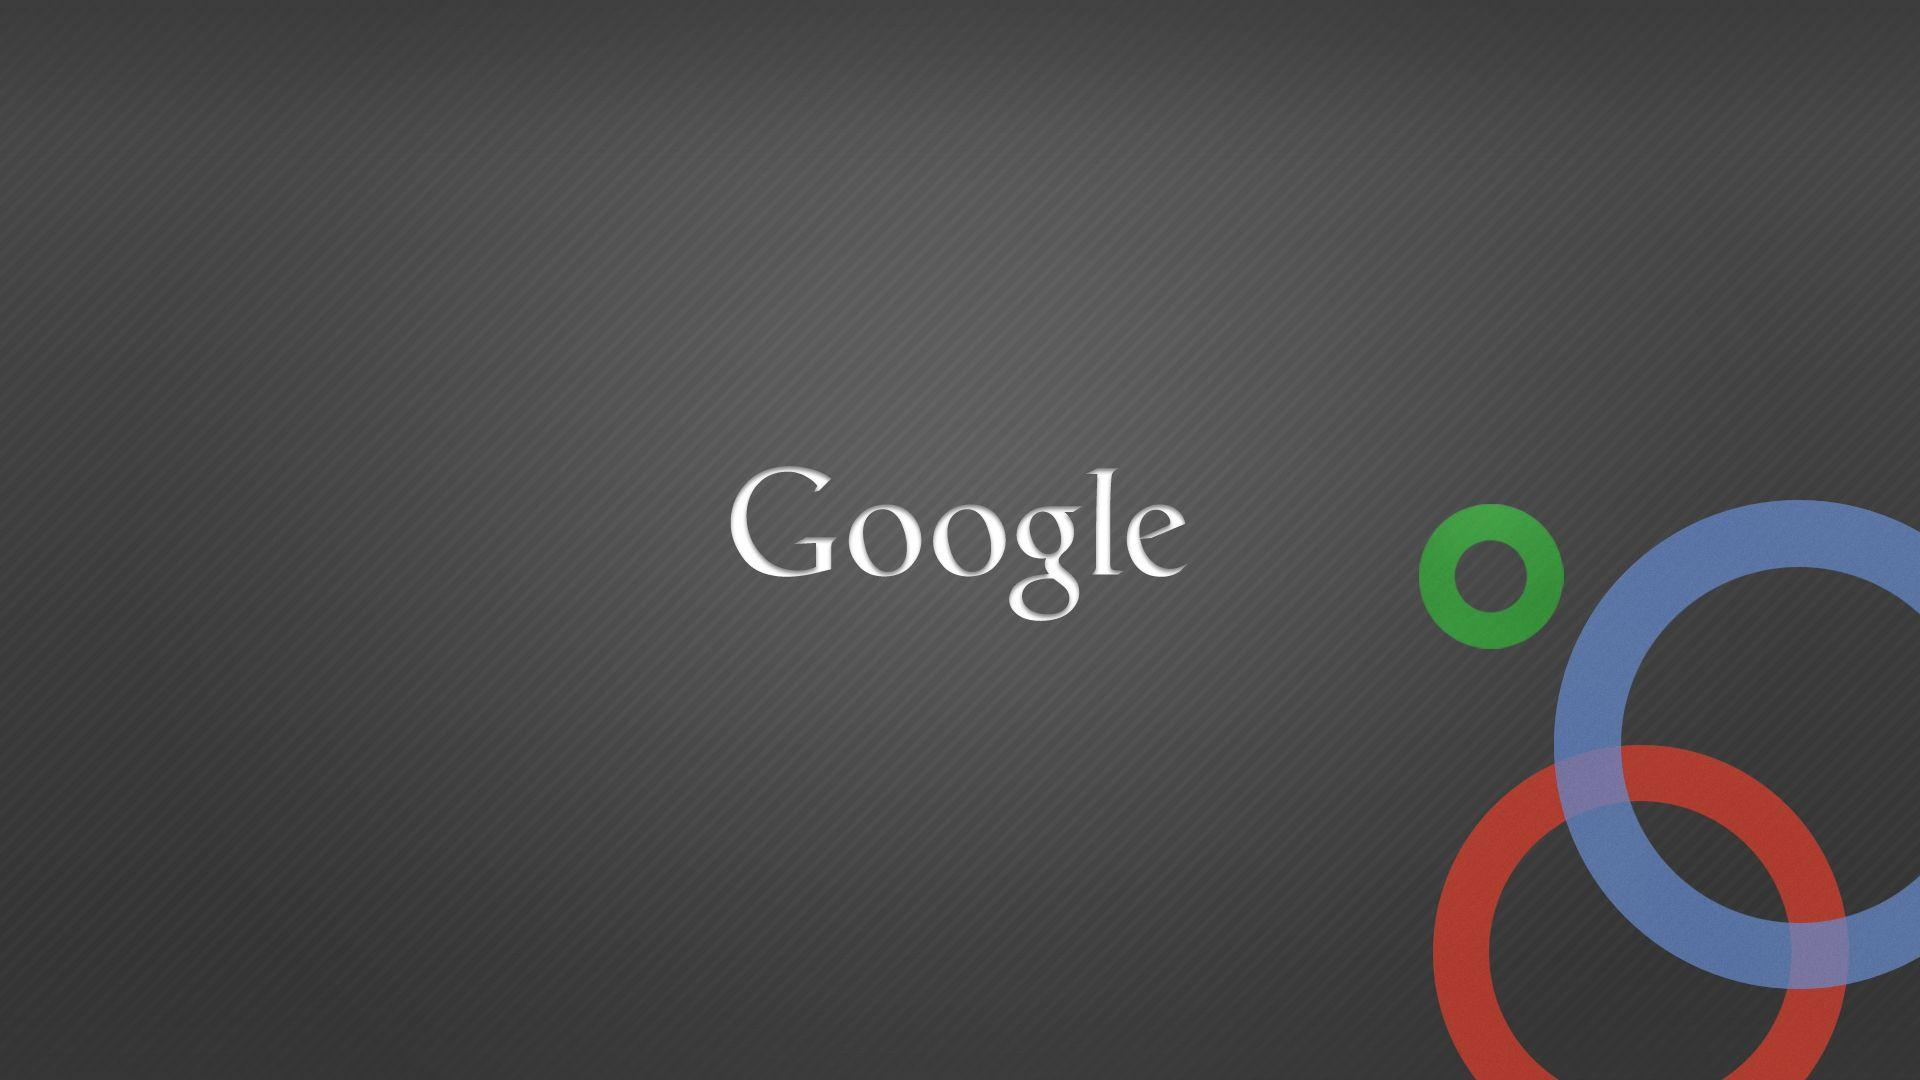 Background Images For Google - Wallpaper Cave